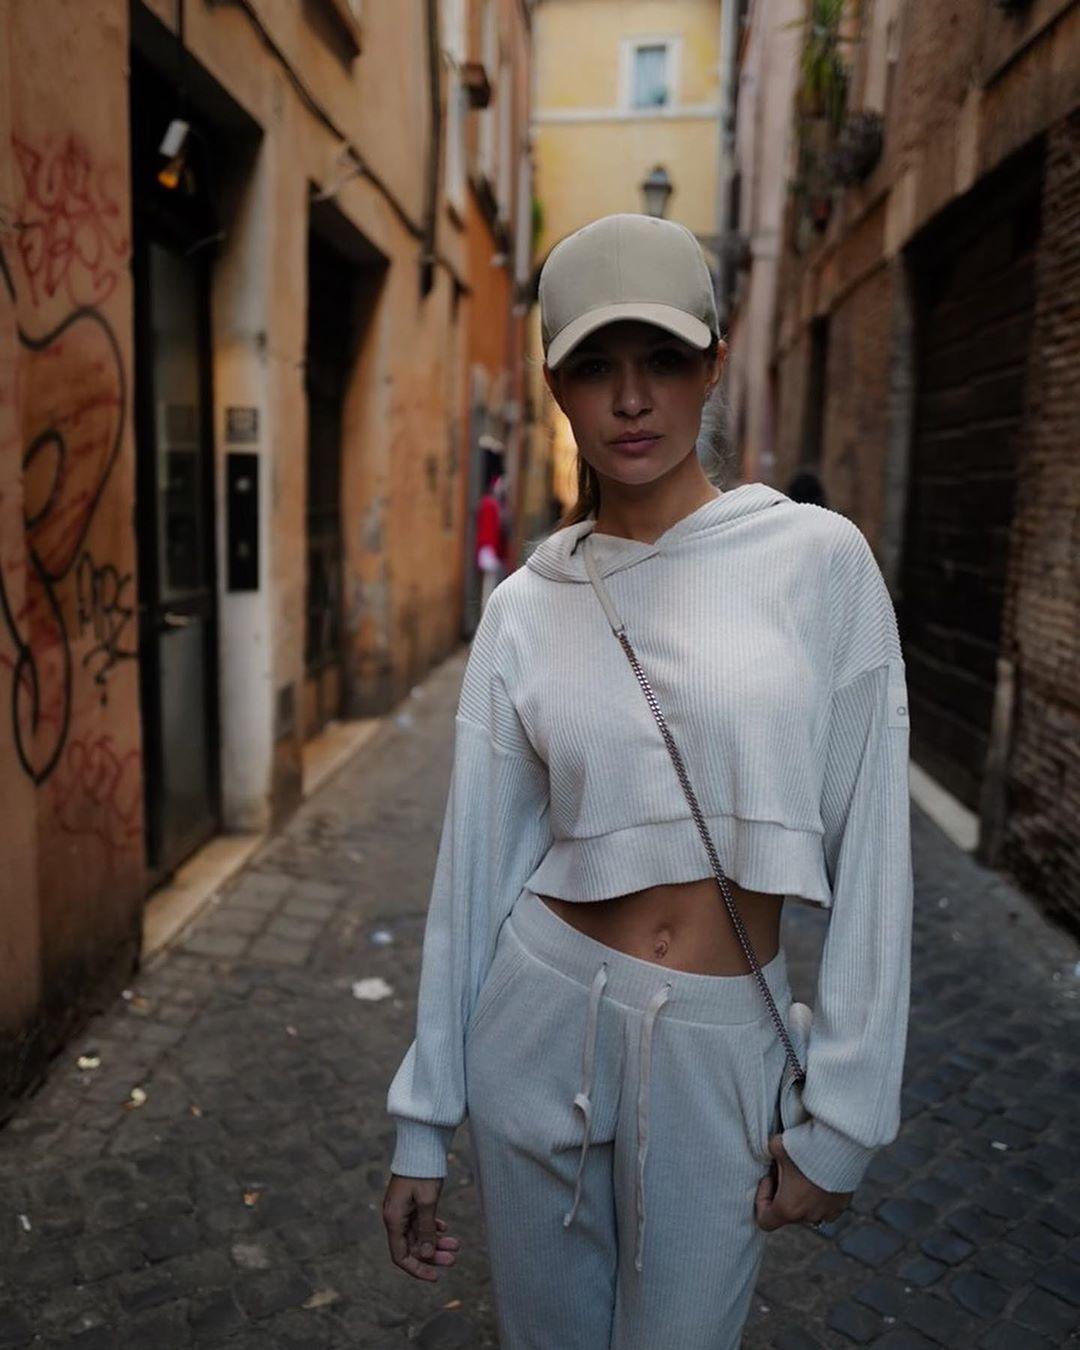 Josephine-Skriver-Wallpapers-Insta-Fit-Bio-5